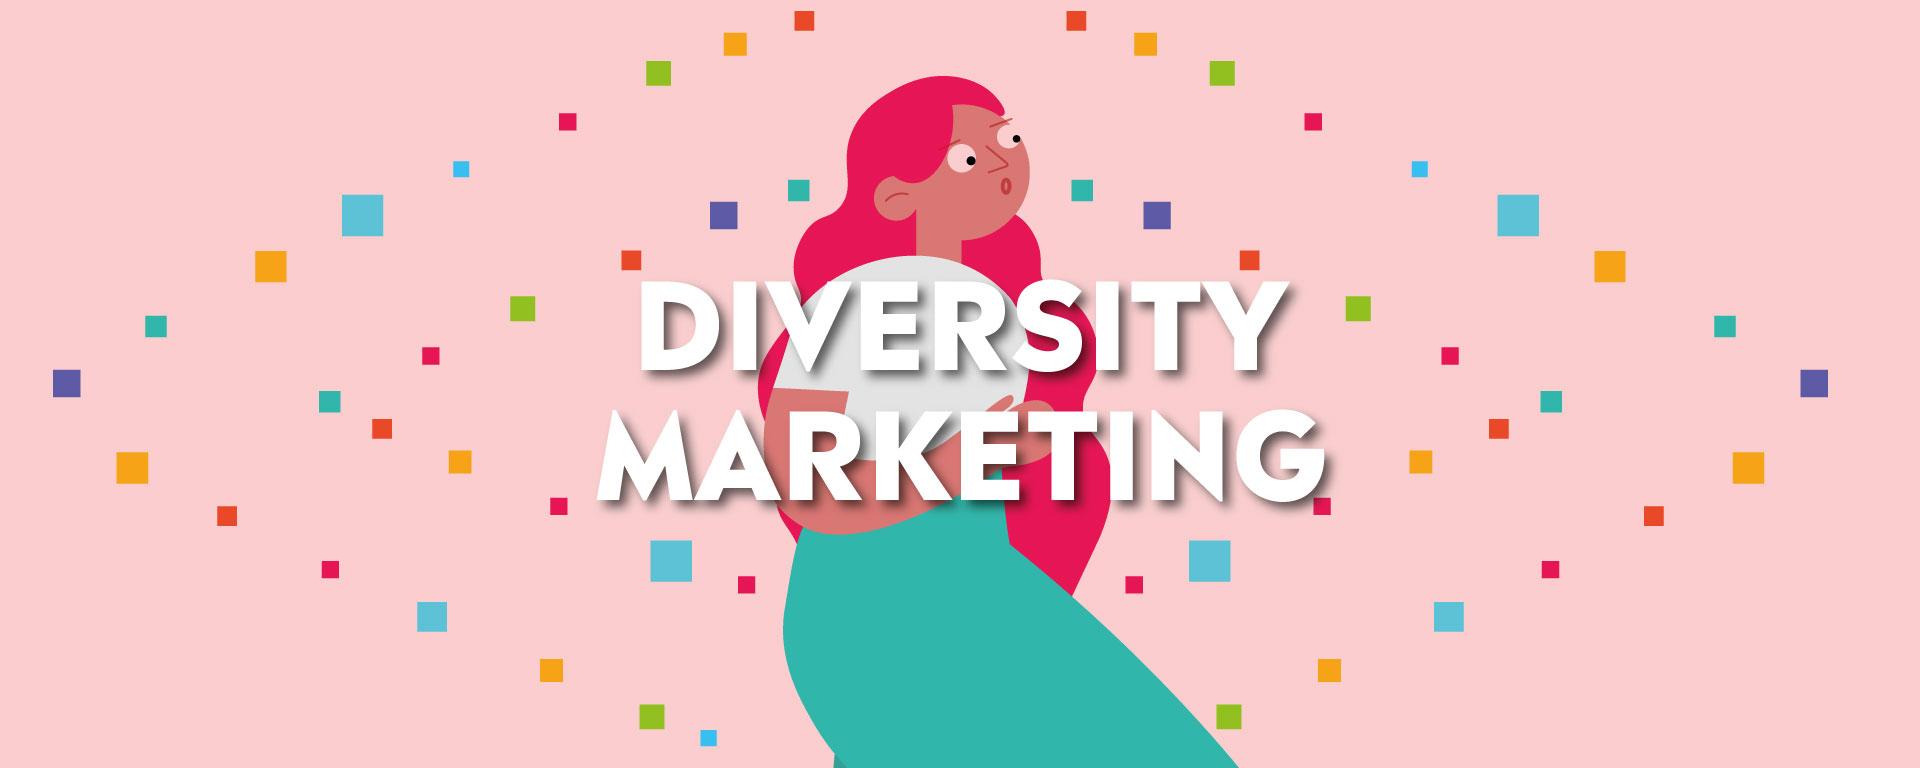 donna_stilizzata_rosa_diversity_marketing_evento